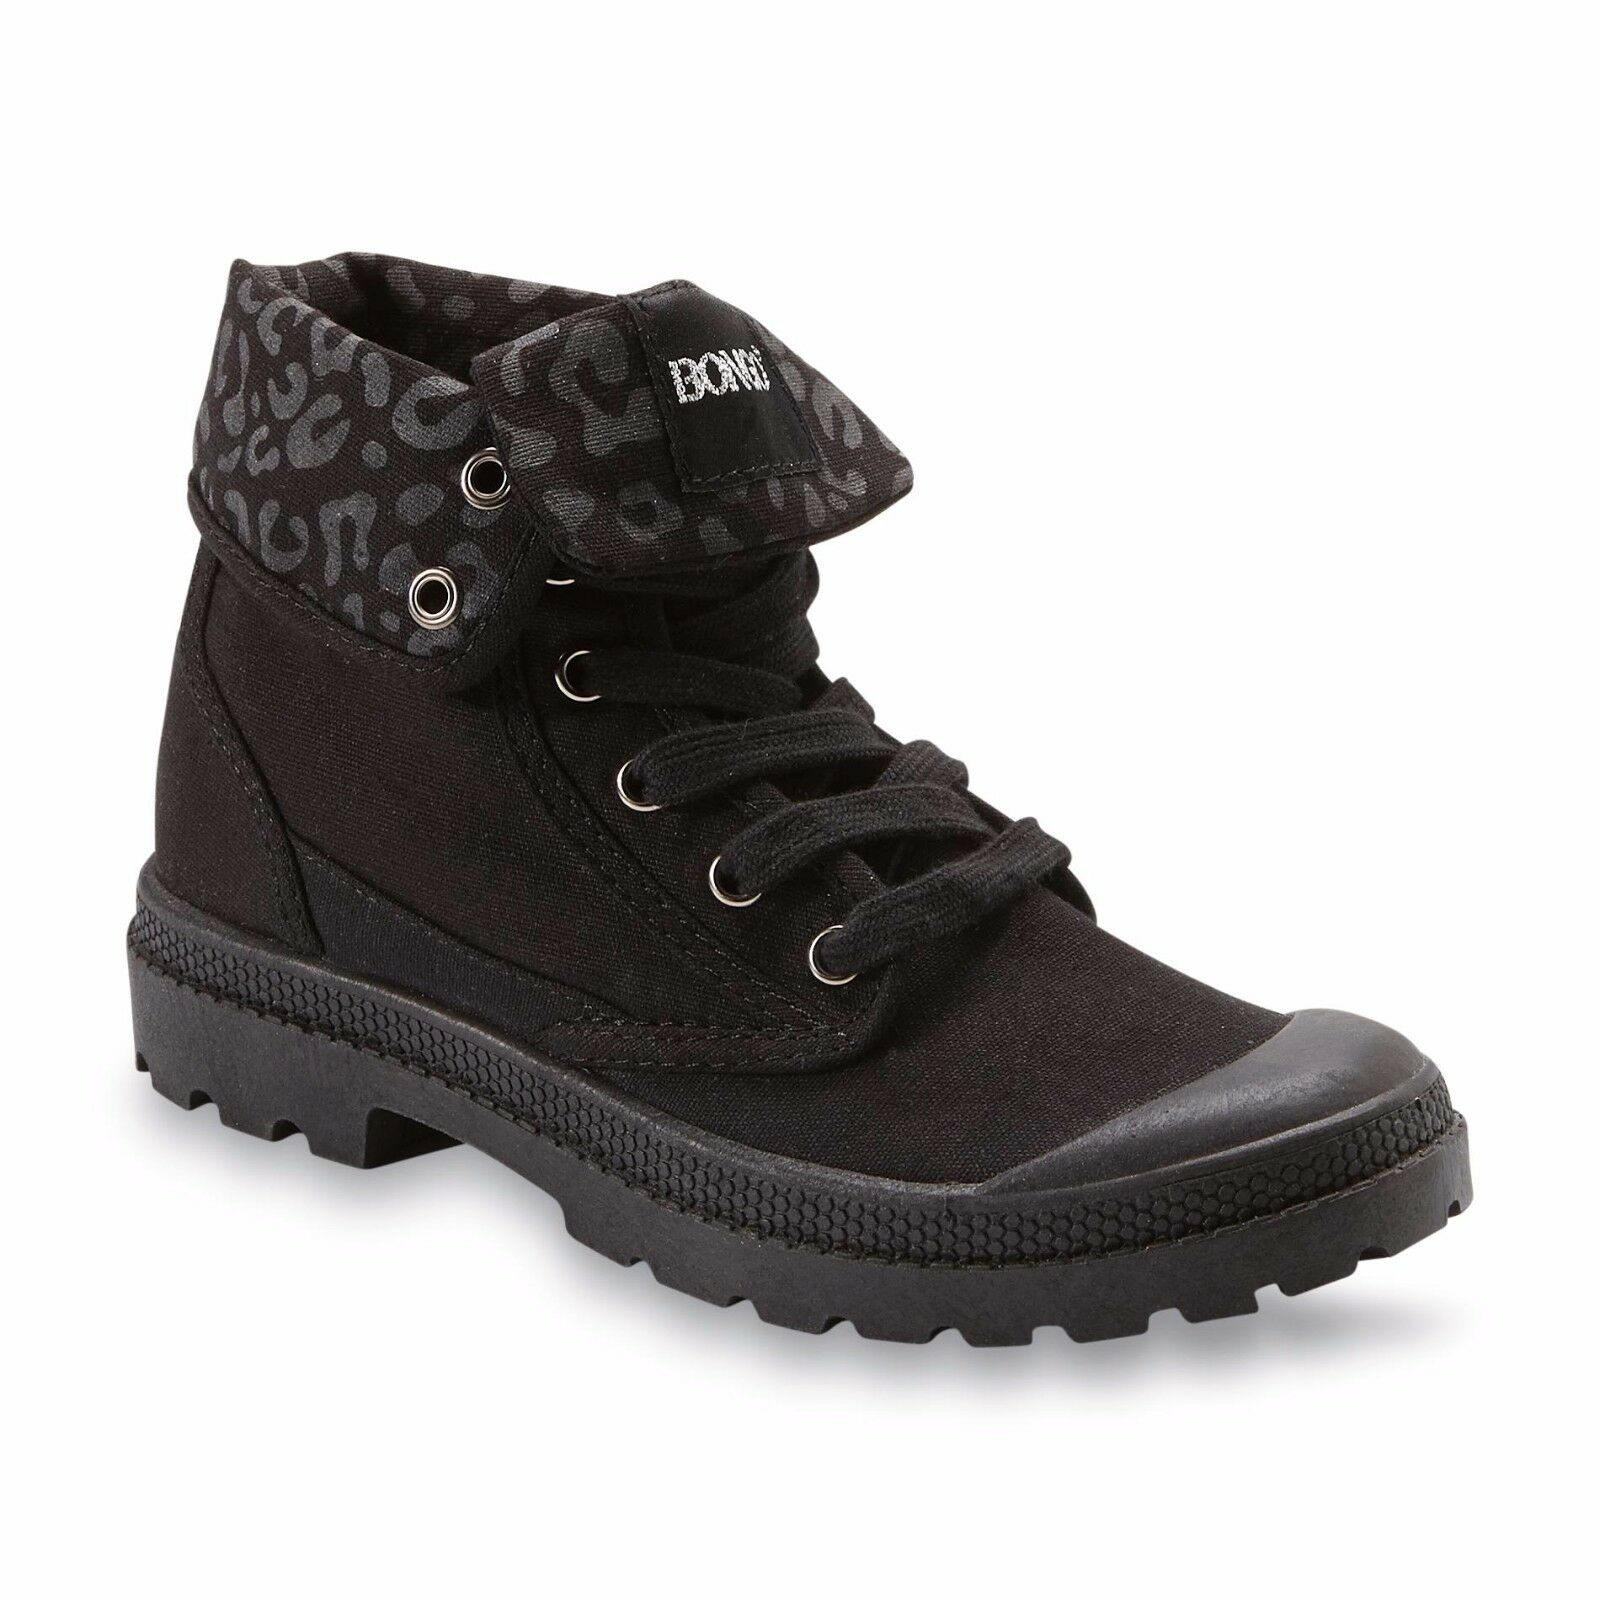 Bongo Women's Tippi Black High-Top Bump-Toe Sneaker shoes Size 7 Medium